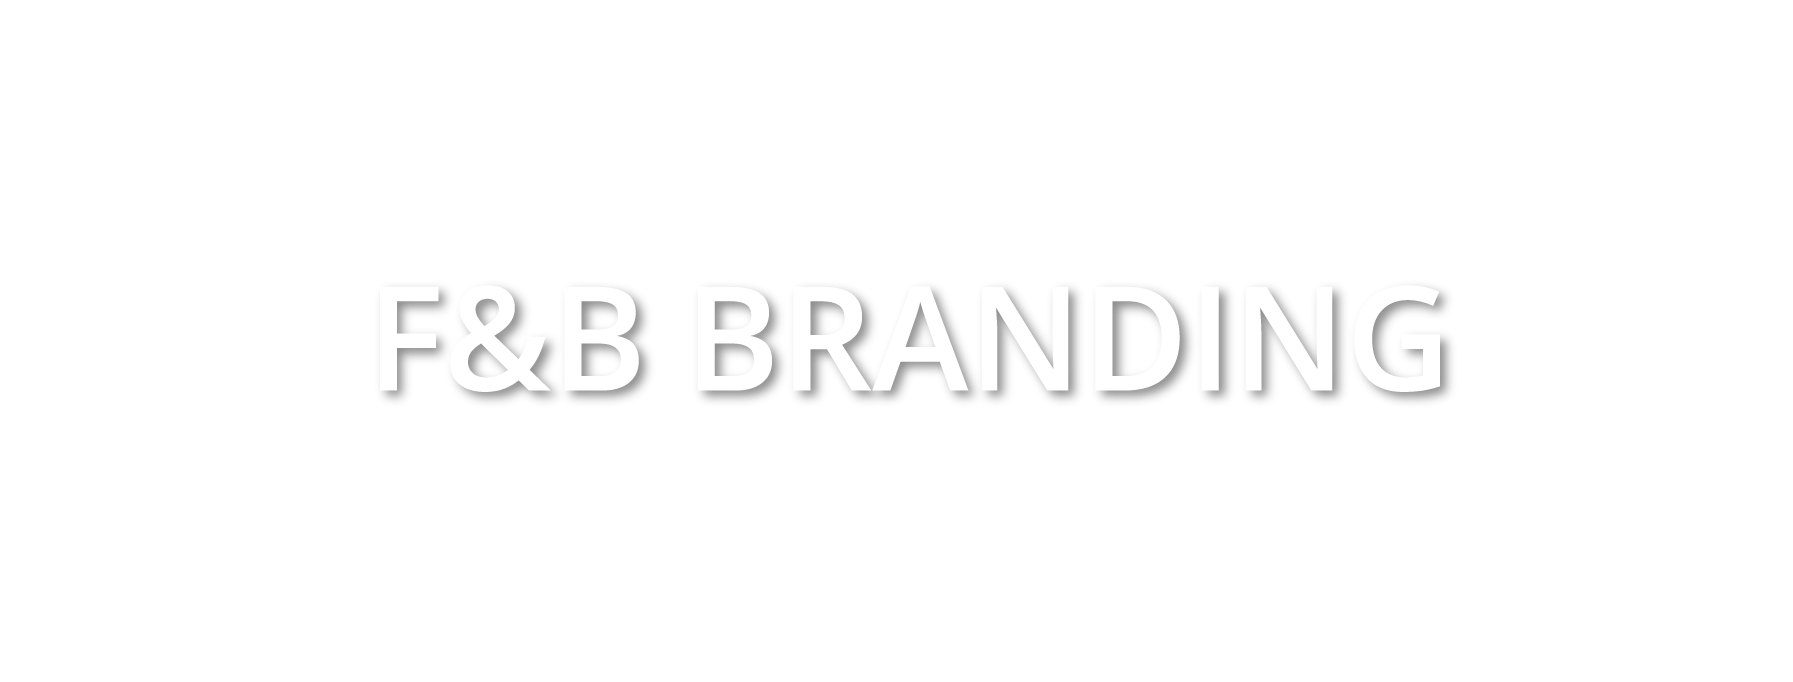 F&B-Branding